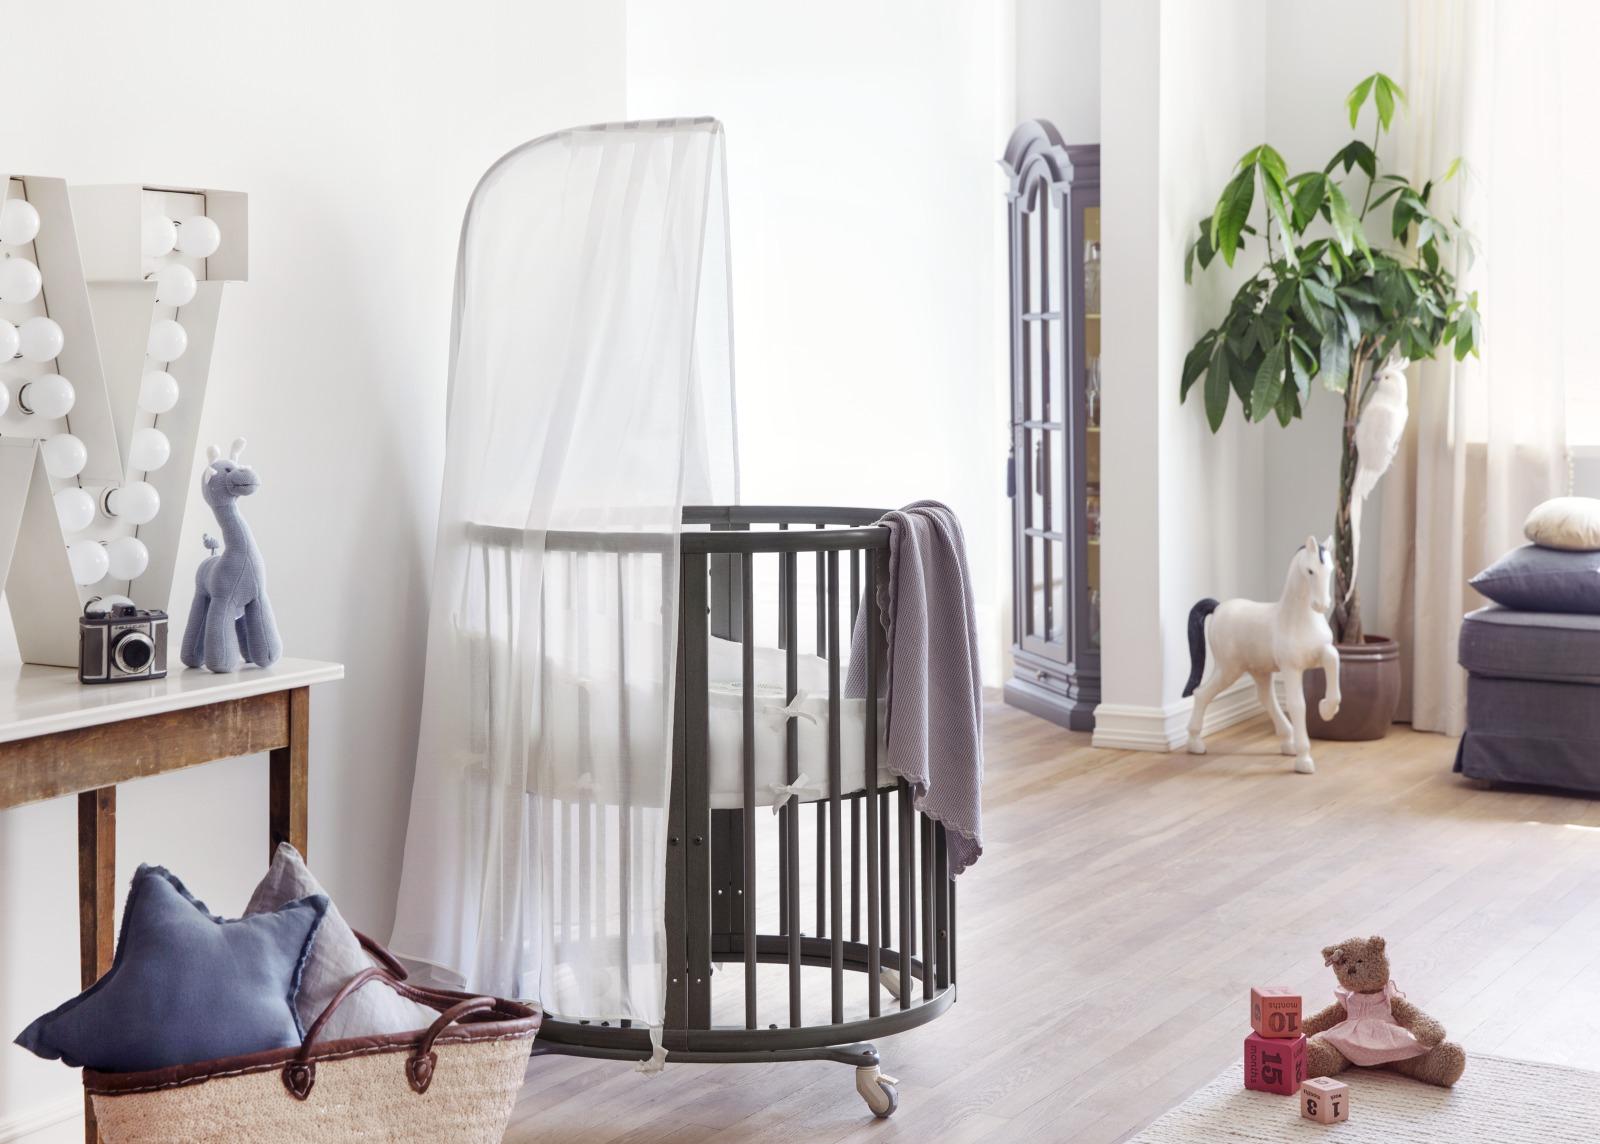 stokke babyseng Stokke® Sleepi™ Mini White stokke babyseng